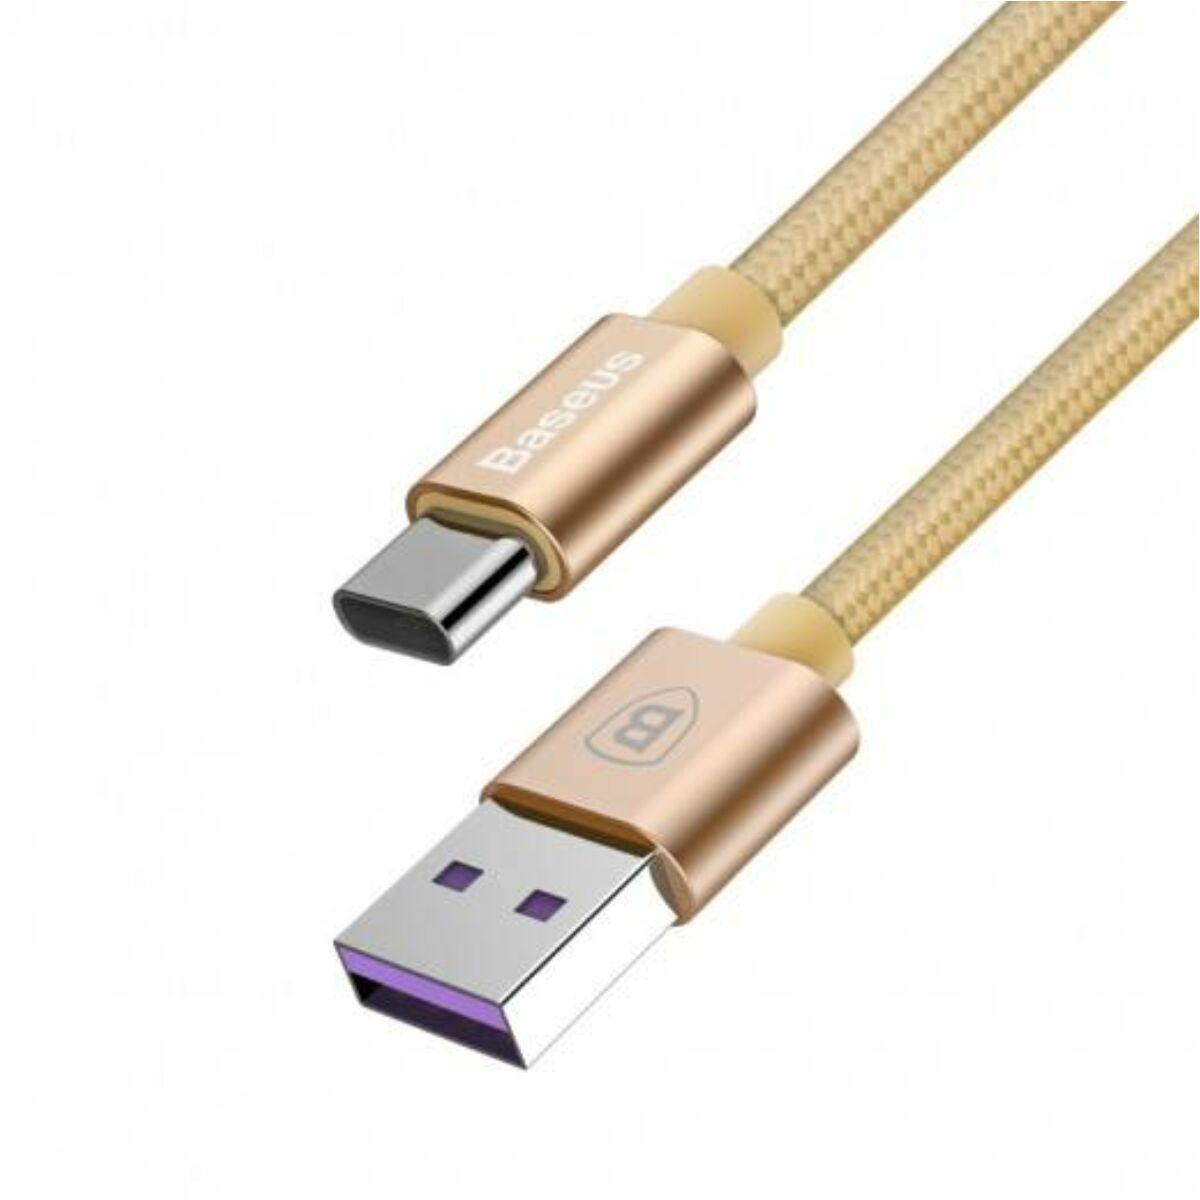 Baseus Type-C kábel, Speed, Type-C, 5A(Huawei Type-C), 1m, arany (CATKC-0V)